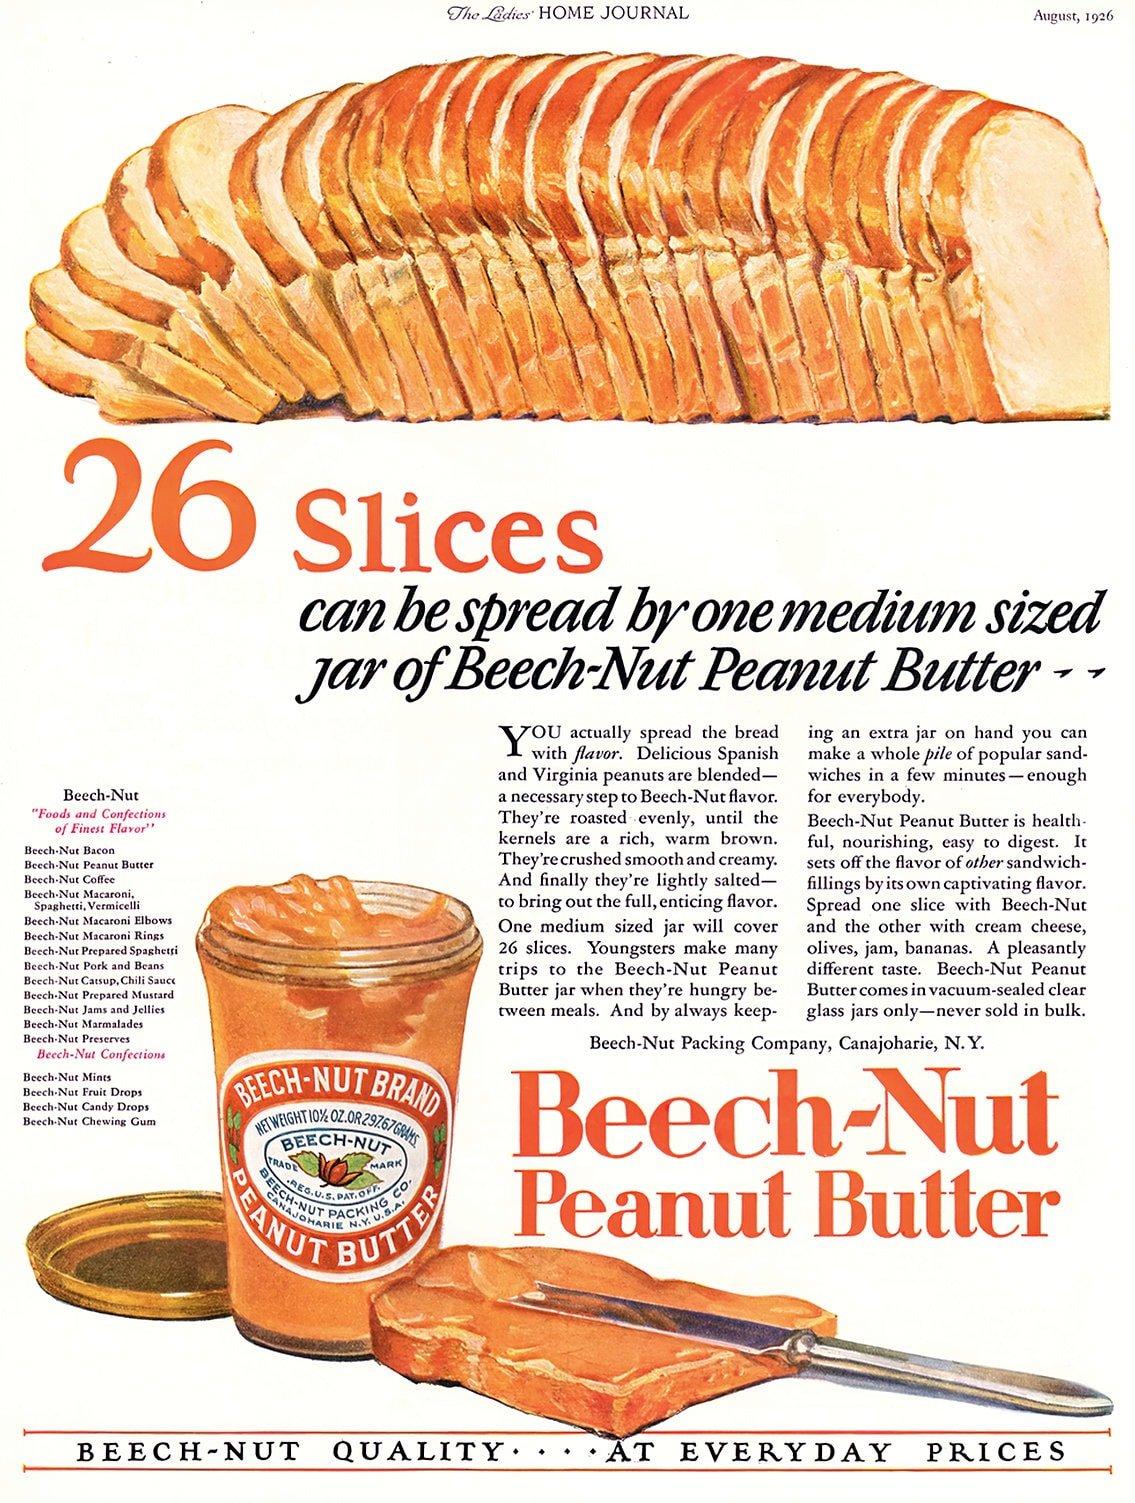 Old-fashioned Beech-Nut peanut butter (1926)